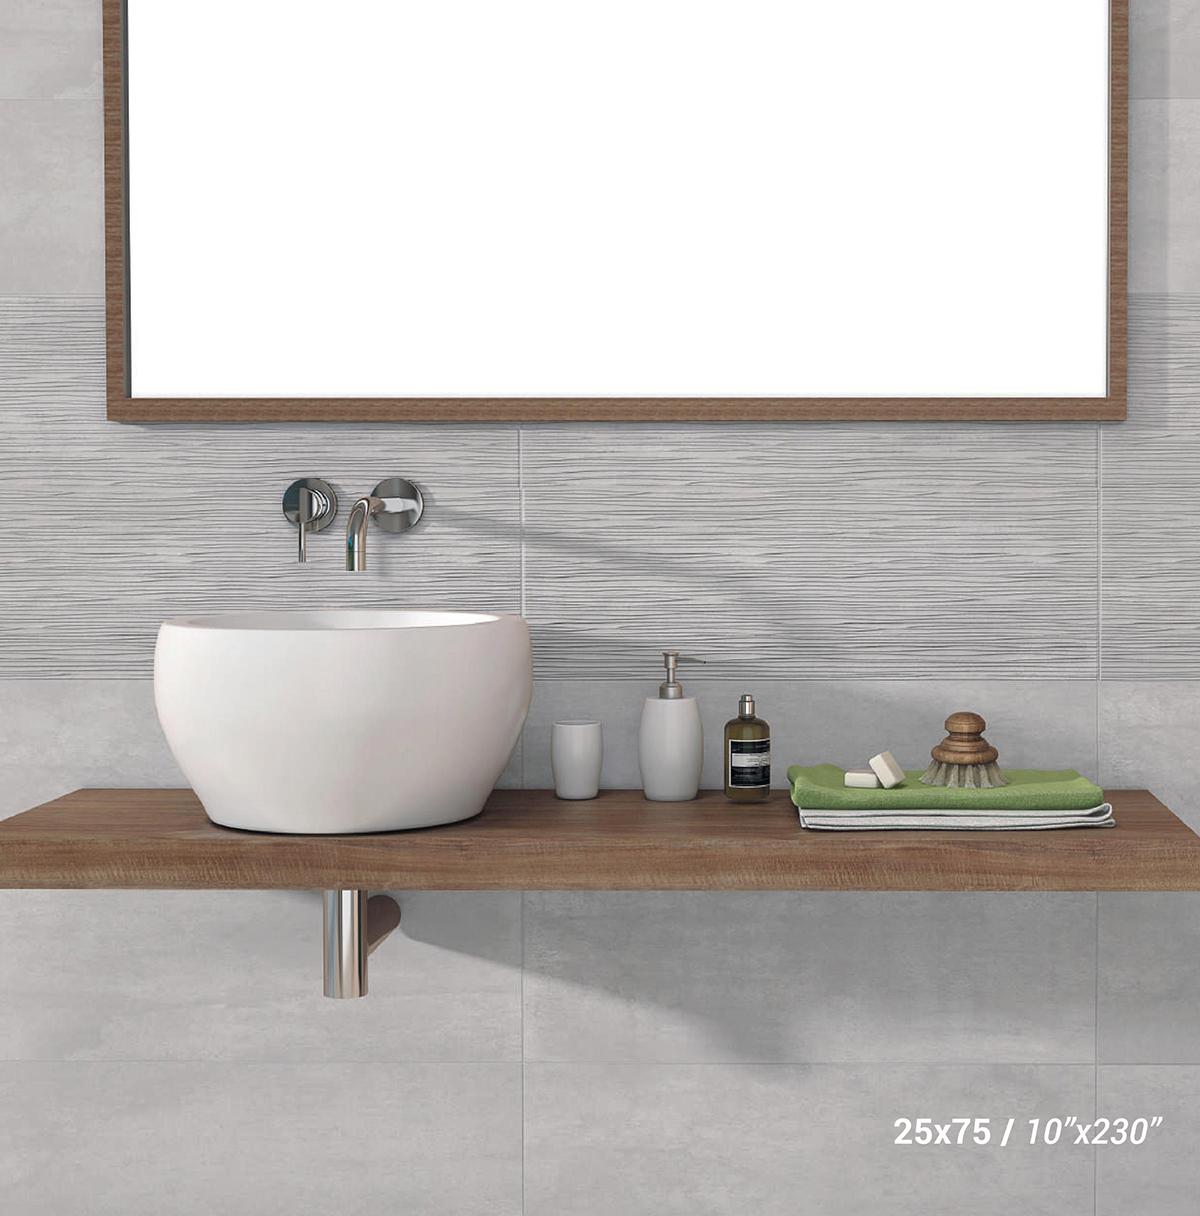 Pitturare Murale Bianco Perla  jabodetabek 2022